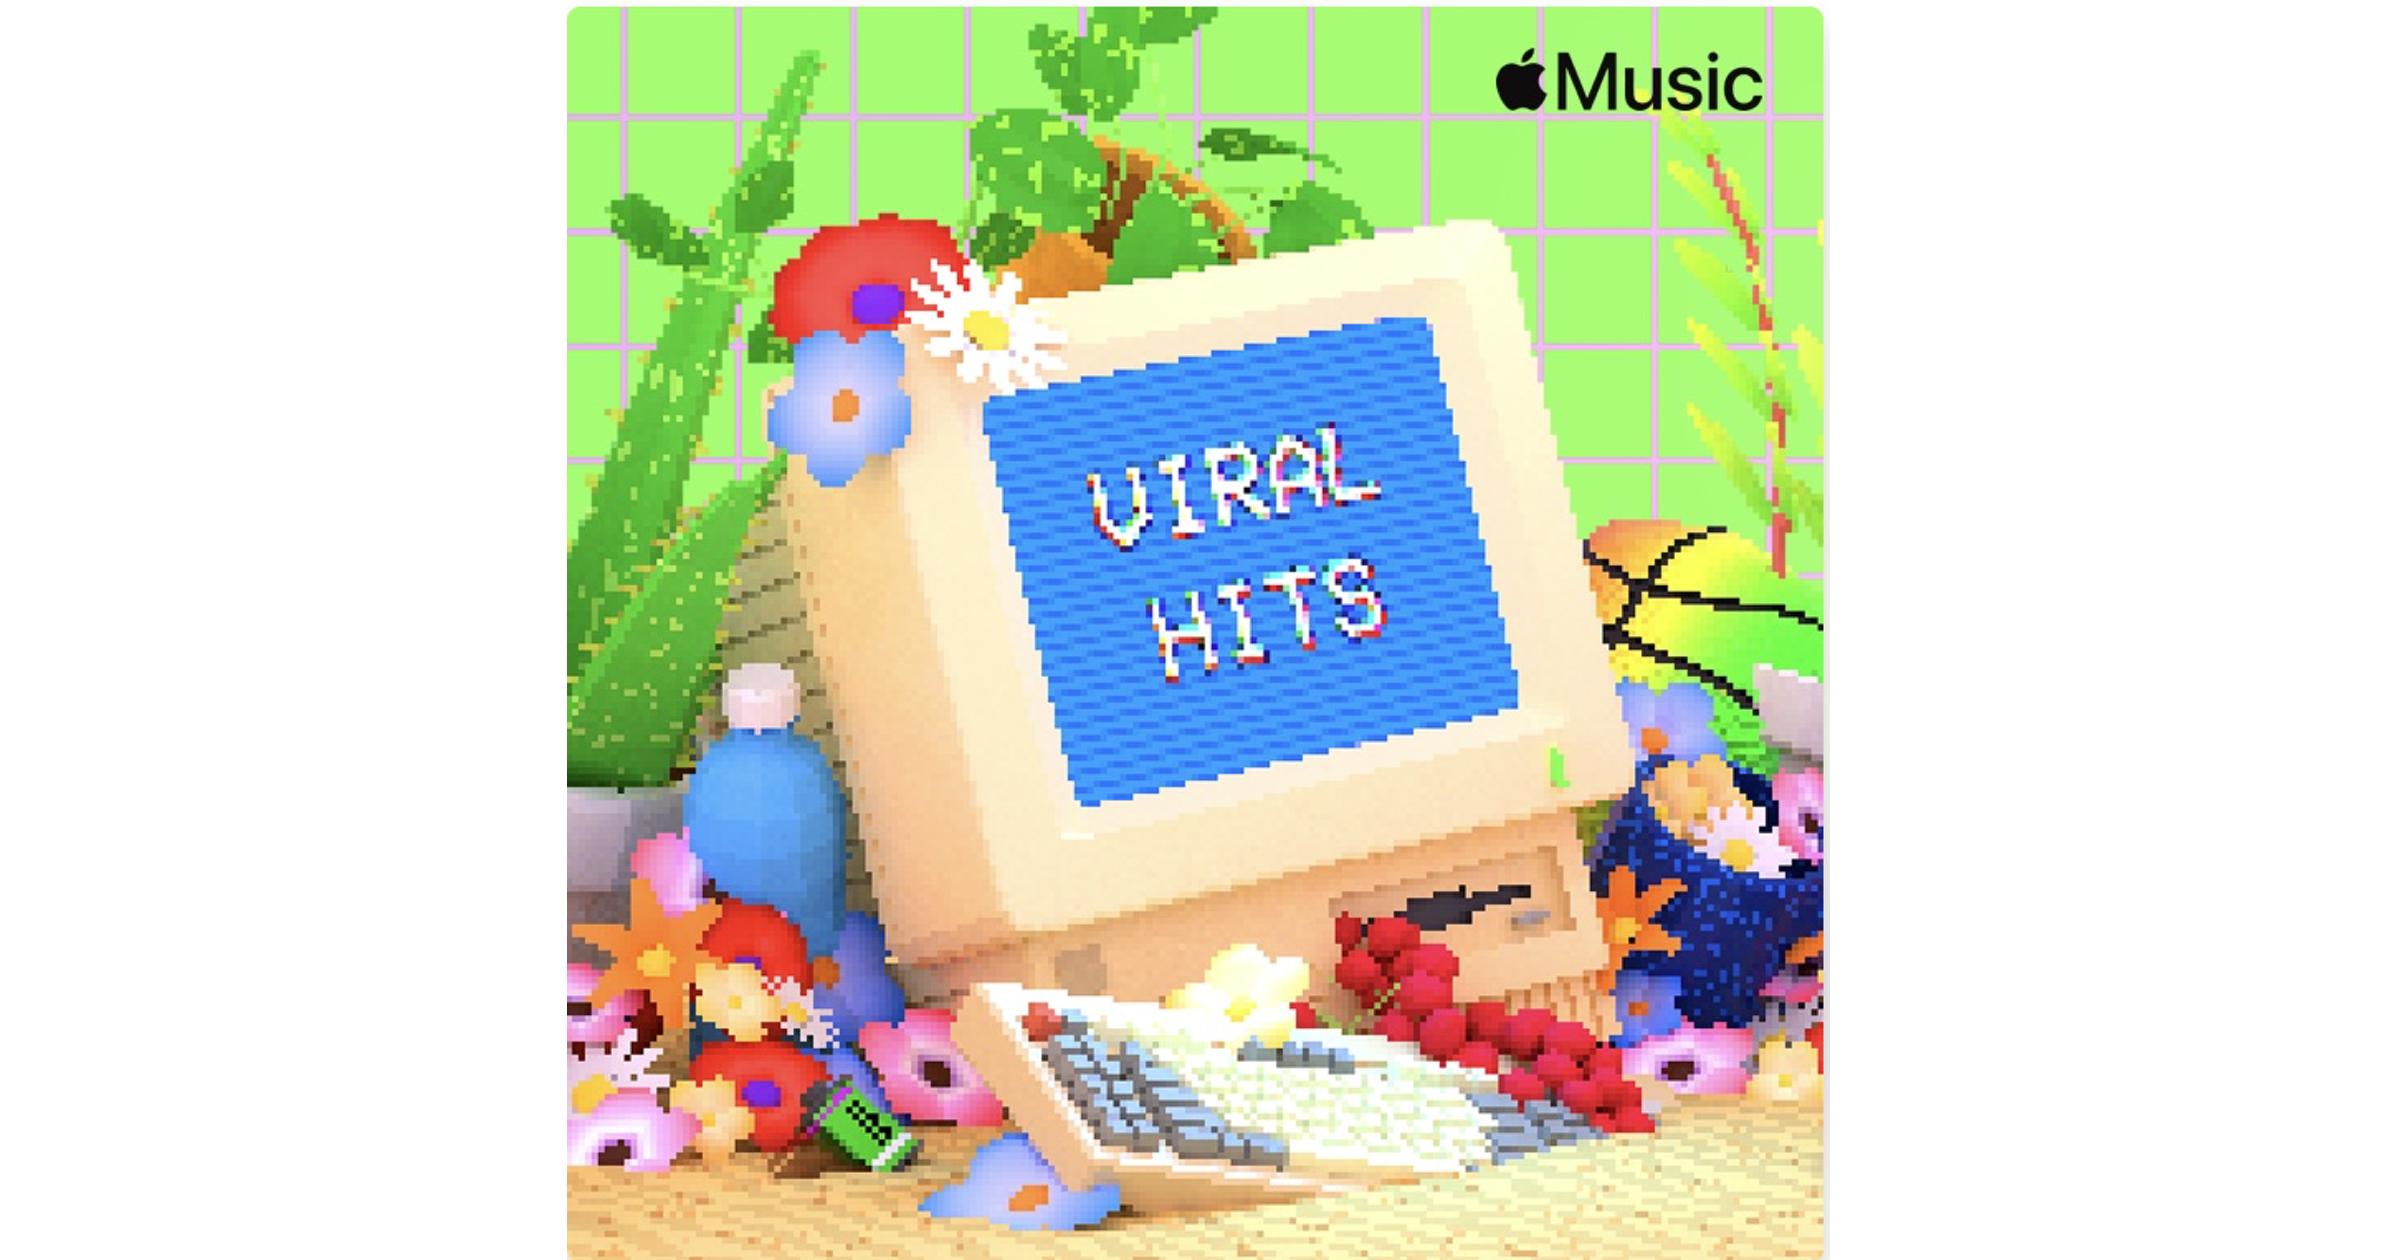 Viral Hits Apple Music playlist